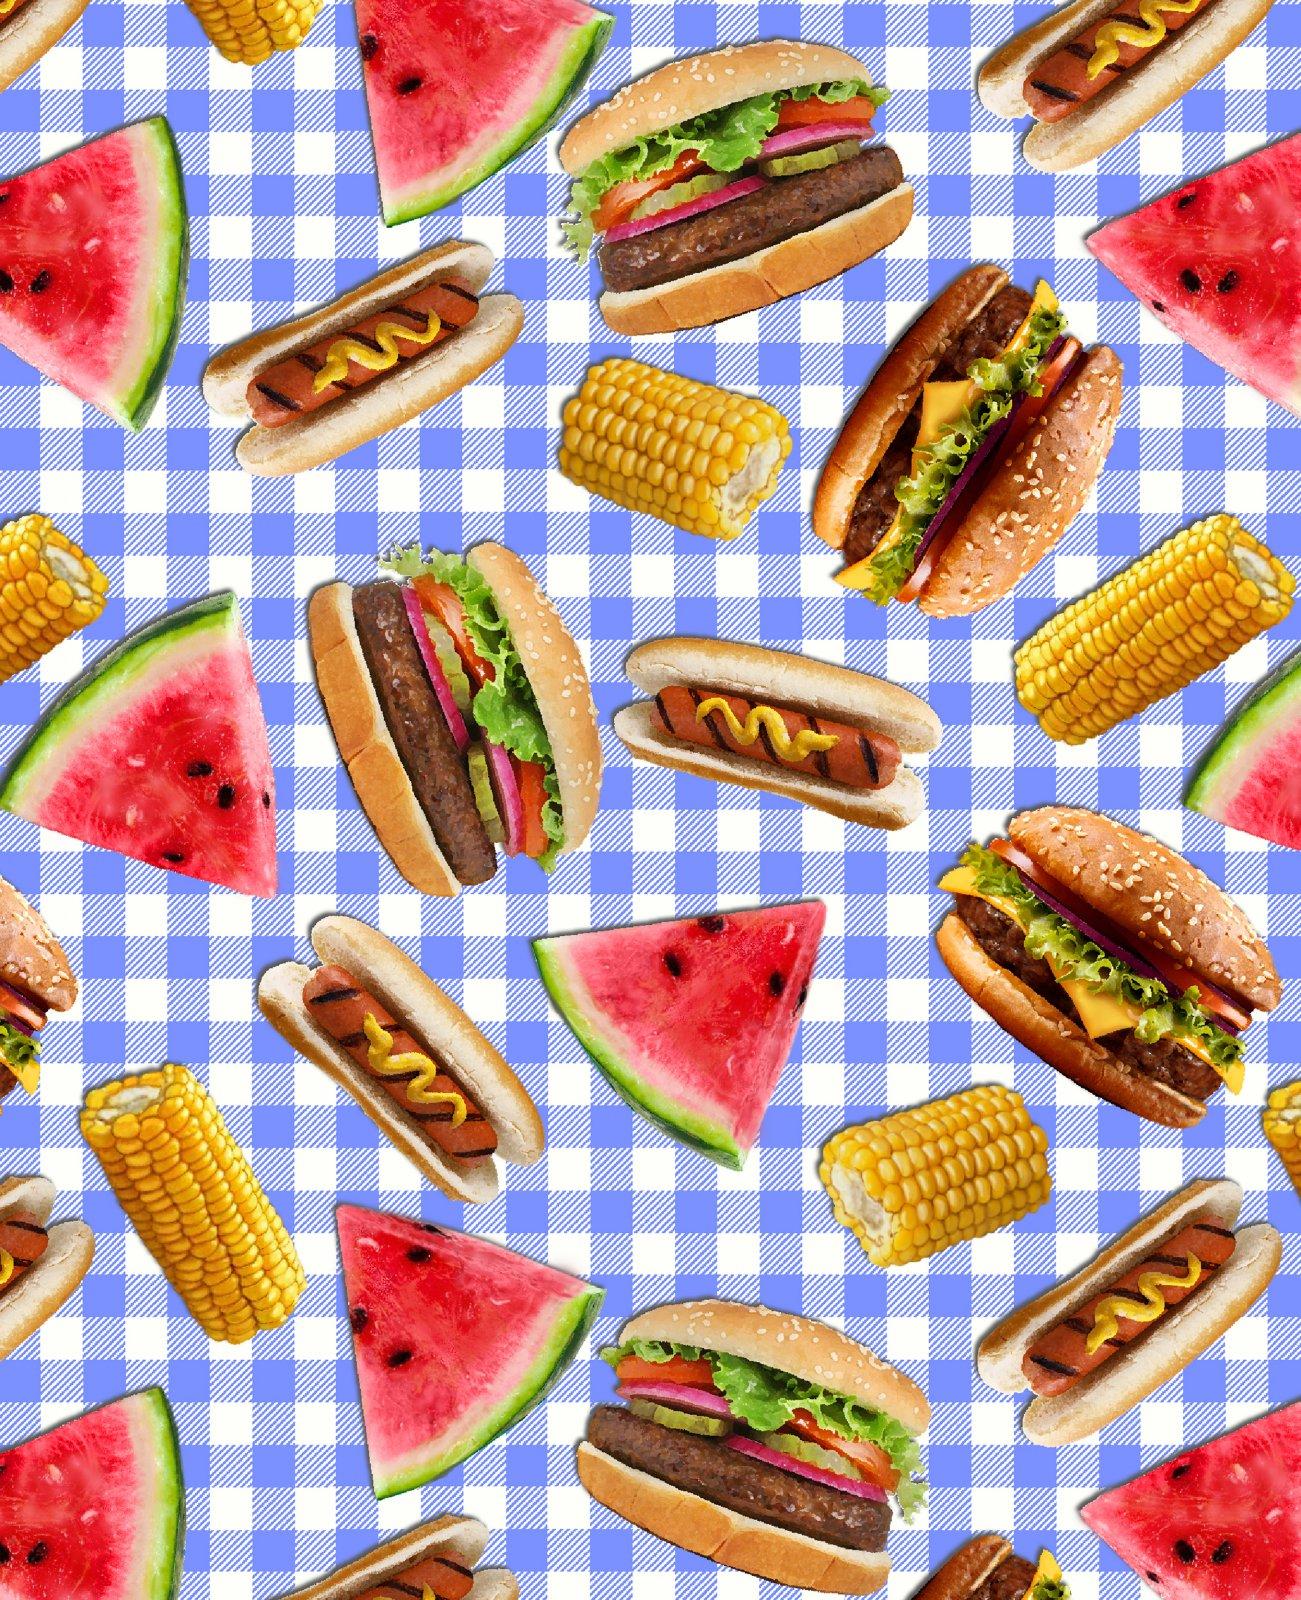 Foodie Watermelon Wallpaper Rainbow Find Free HD for Desktop [freshlhys.tk]